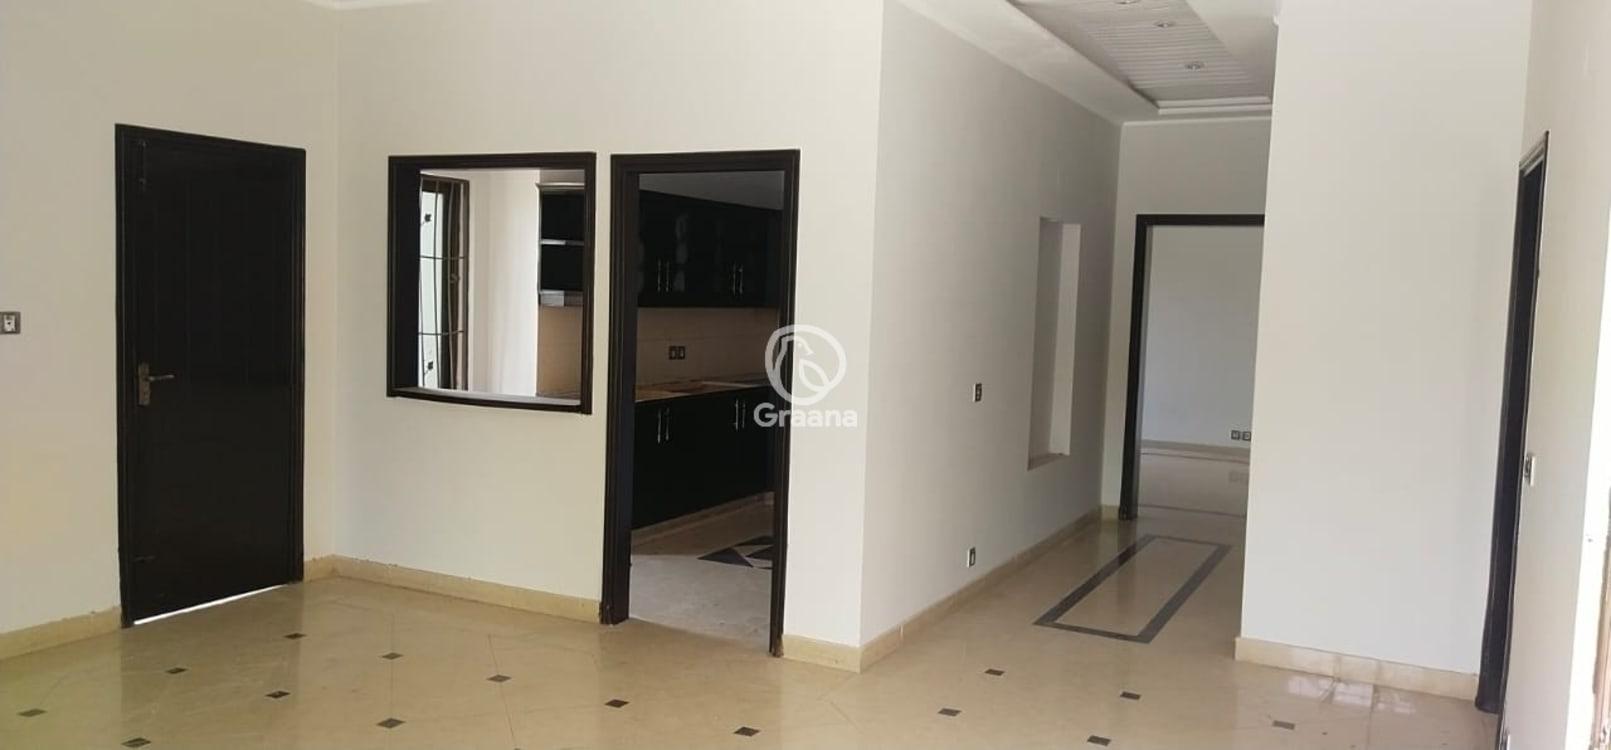 15 Marla House For Sale   Graana.com